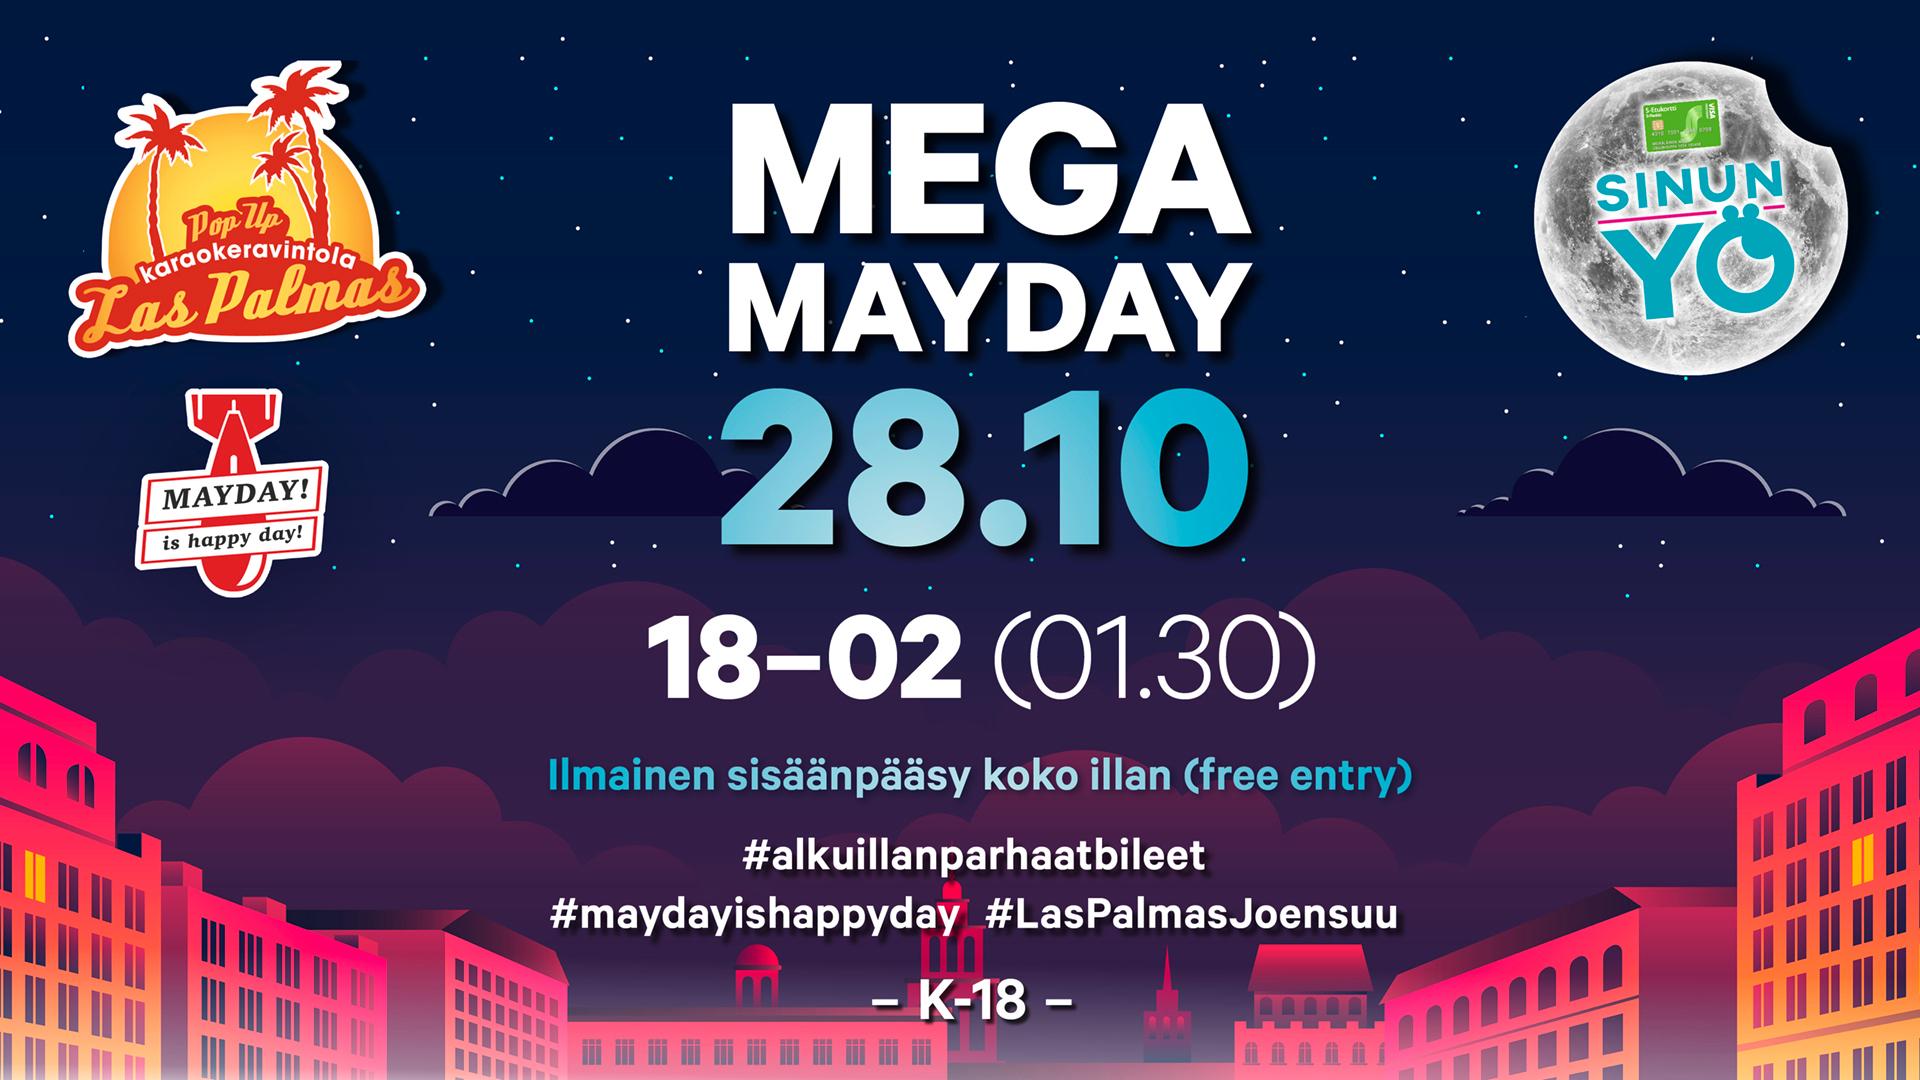 Mega Mayday Sinun Yössä 28.10.